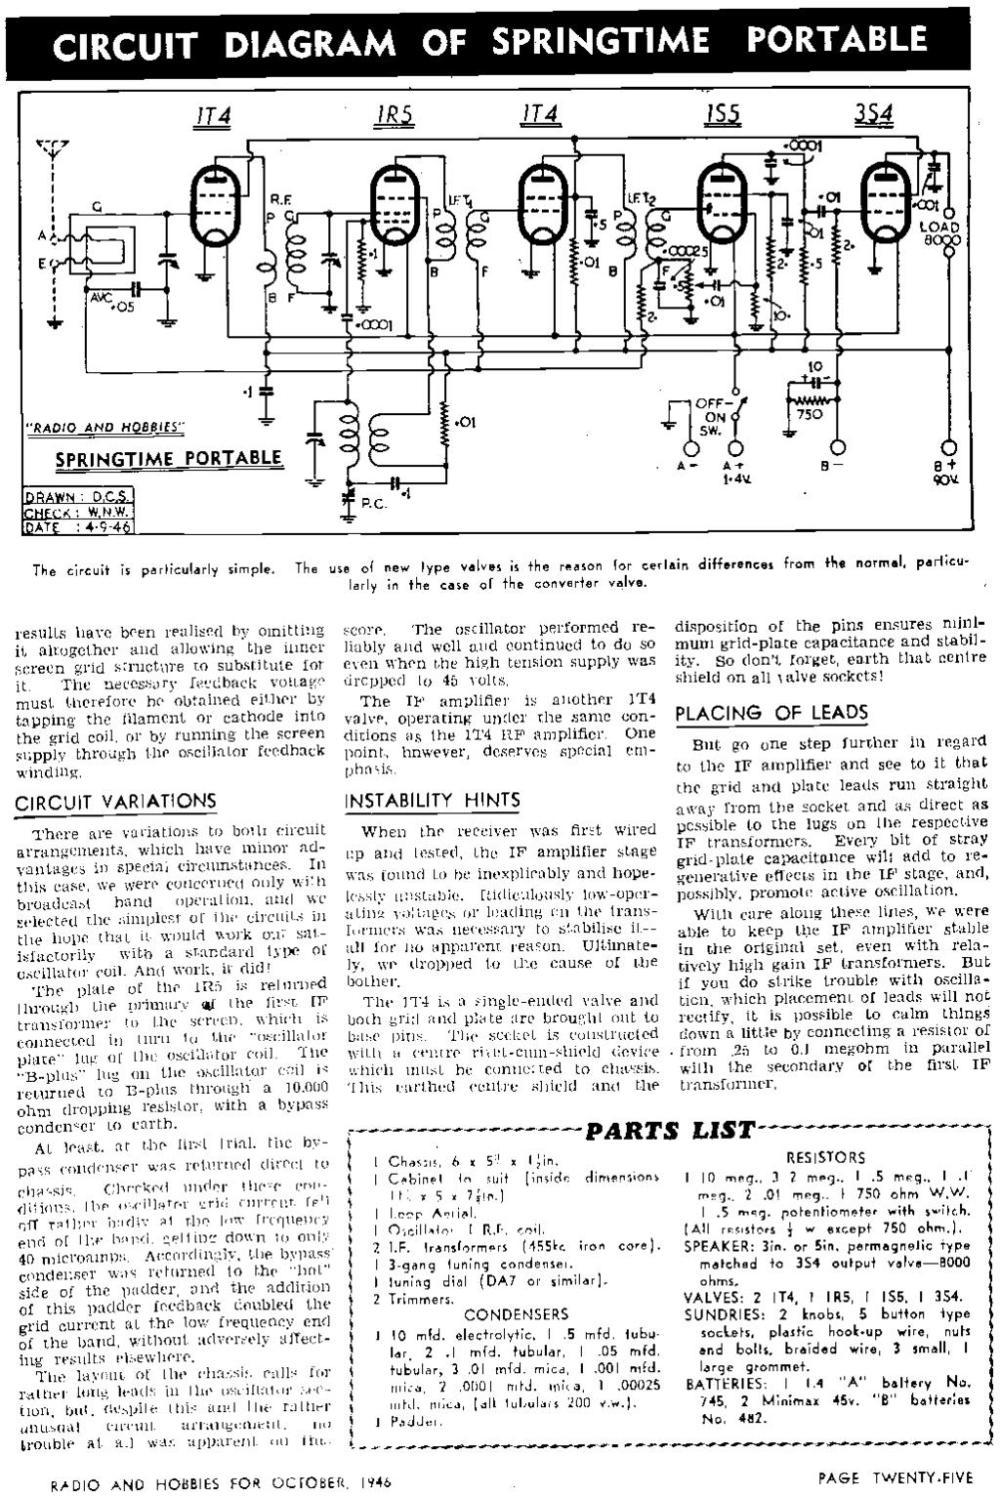 medium resolution of lw i 05 i ii i 14 circuit diagram of springtime portable 174 174 la s